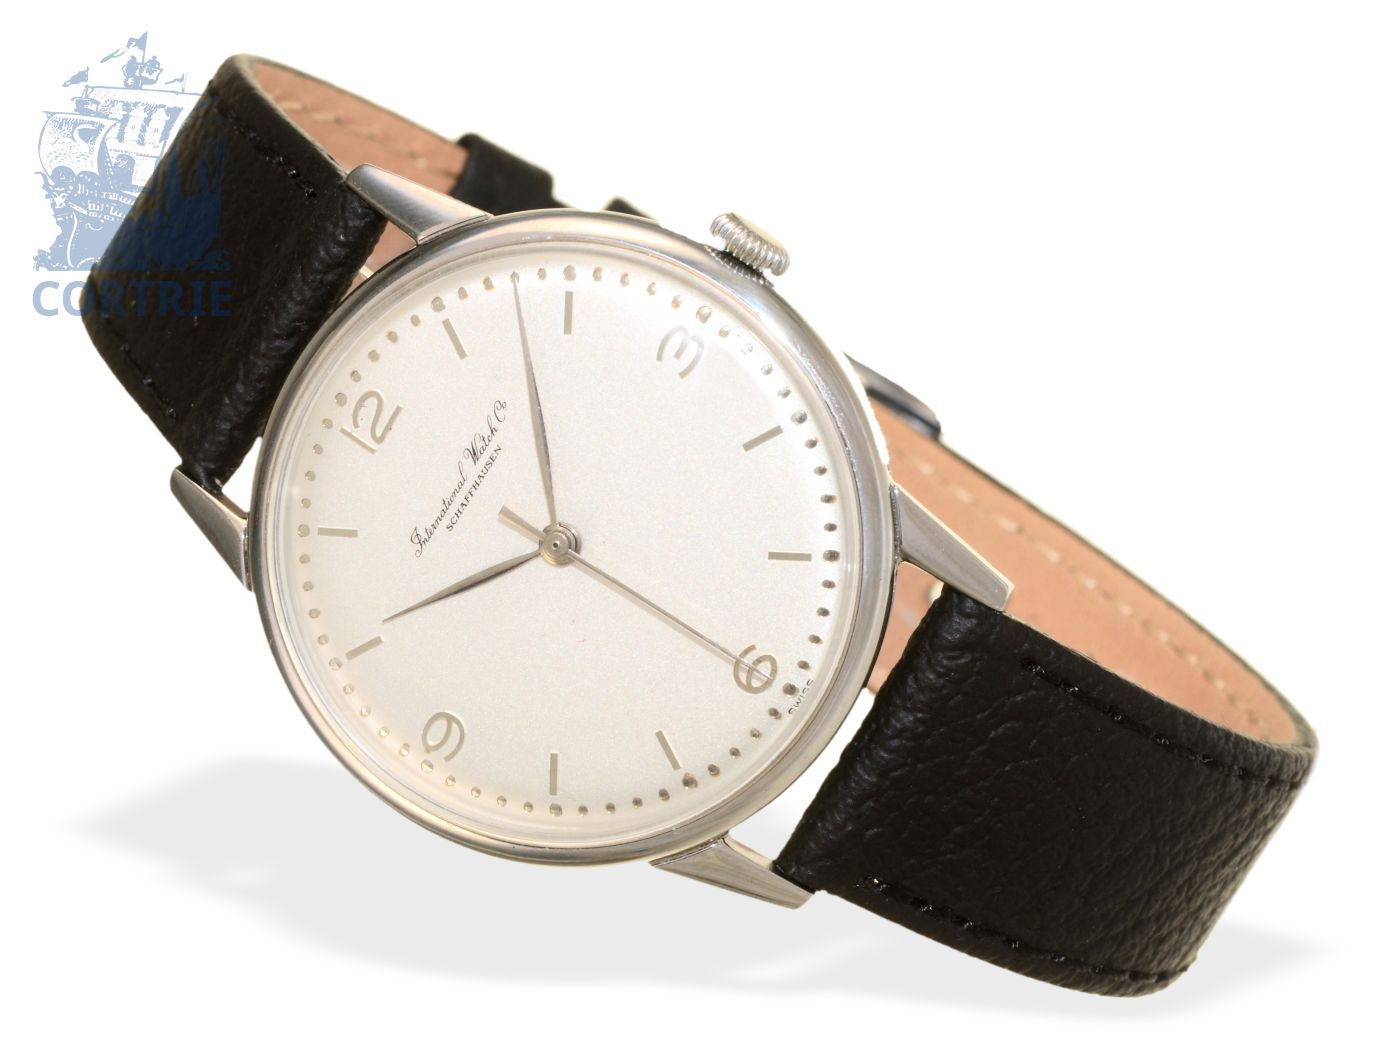 Wristwatch: elegant and fine IWC caliber 89 with center seconds, Schaffhausen 1954-